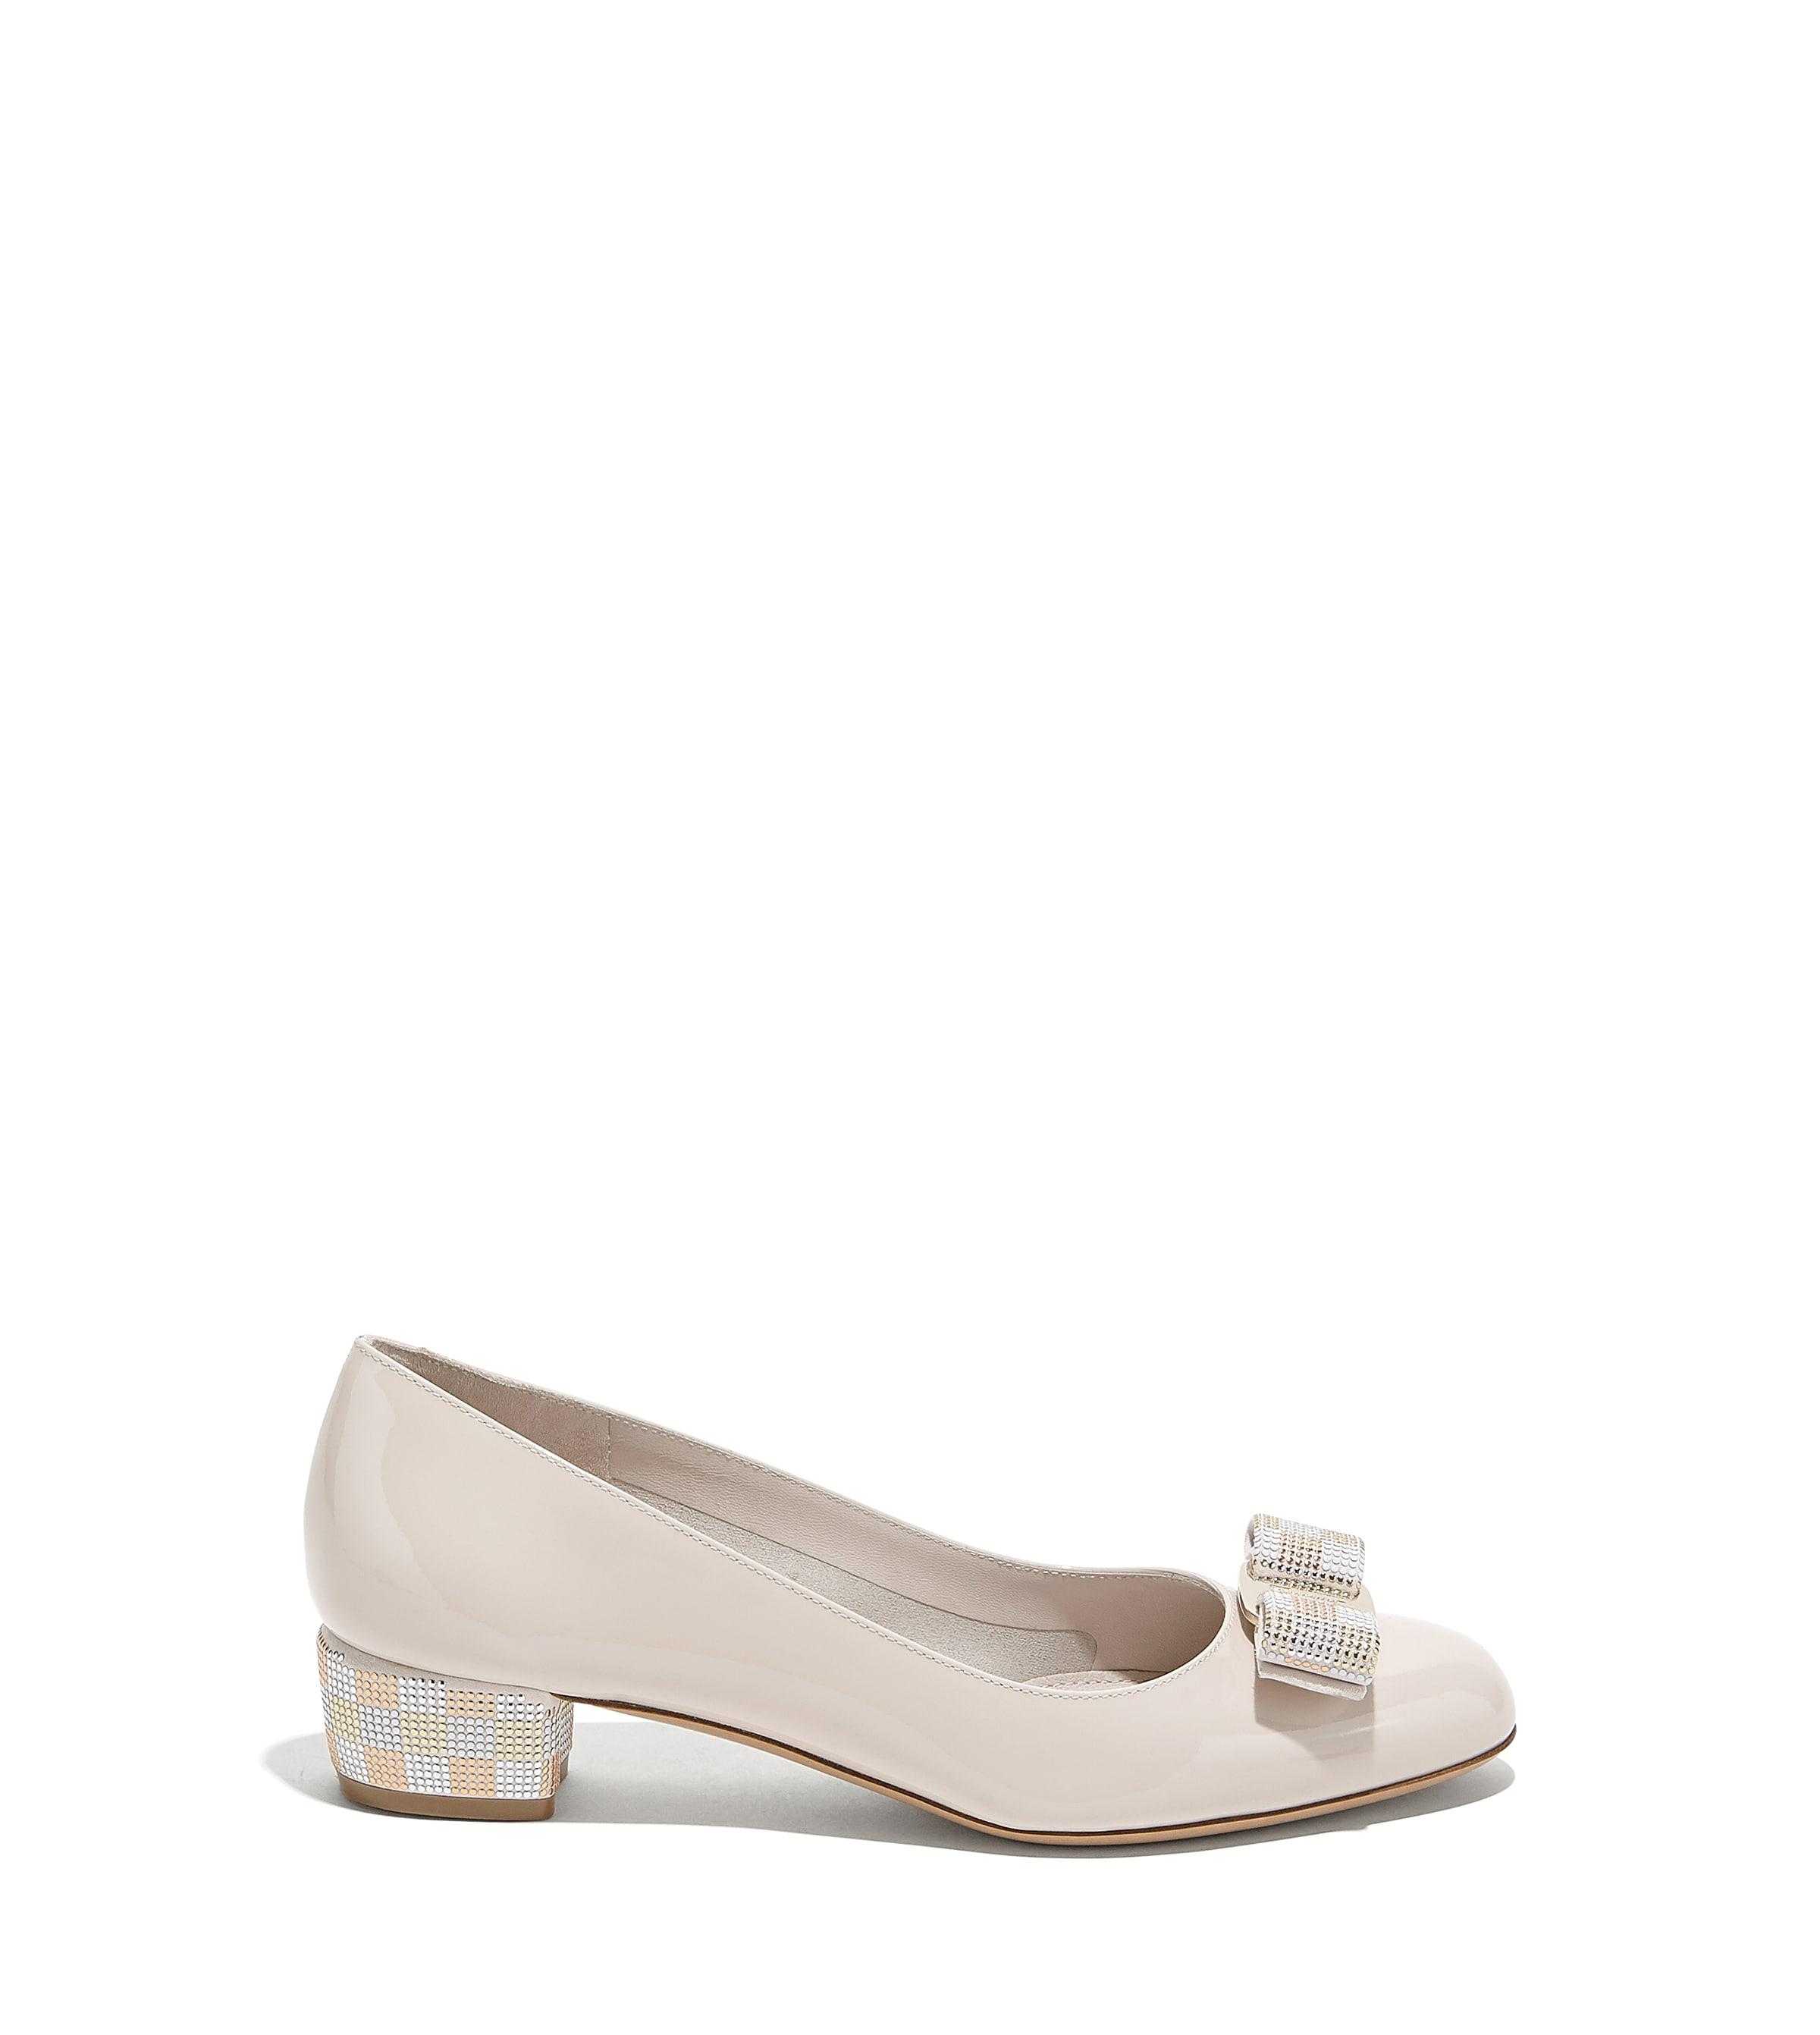 Mosaic Vara Bow Pump Shoe - Shoes - Women - Salvatore Ferragamo EU